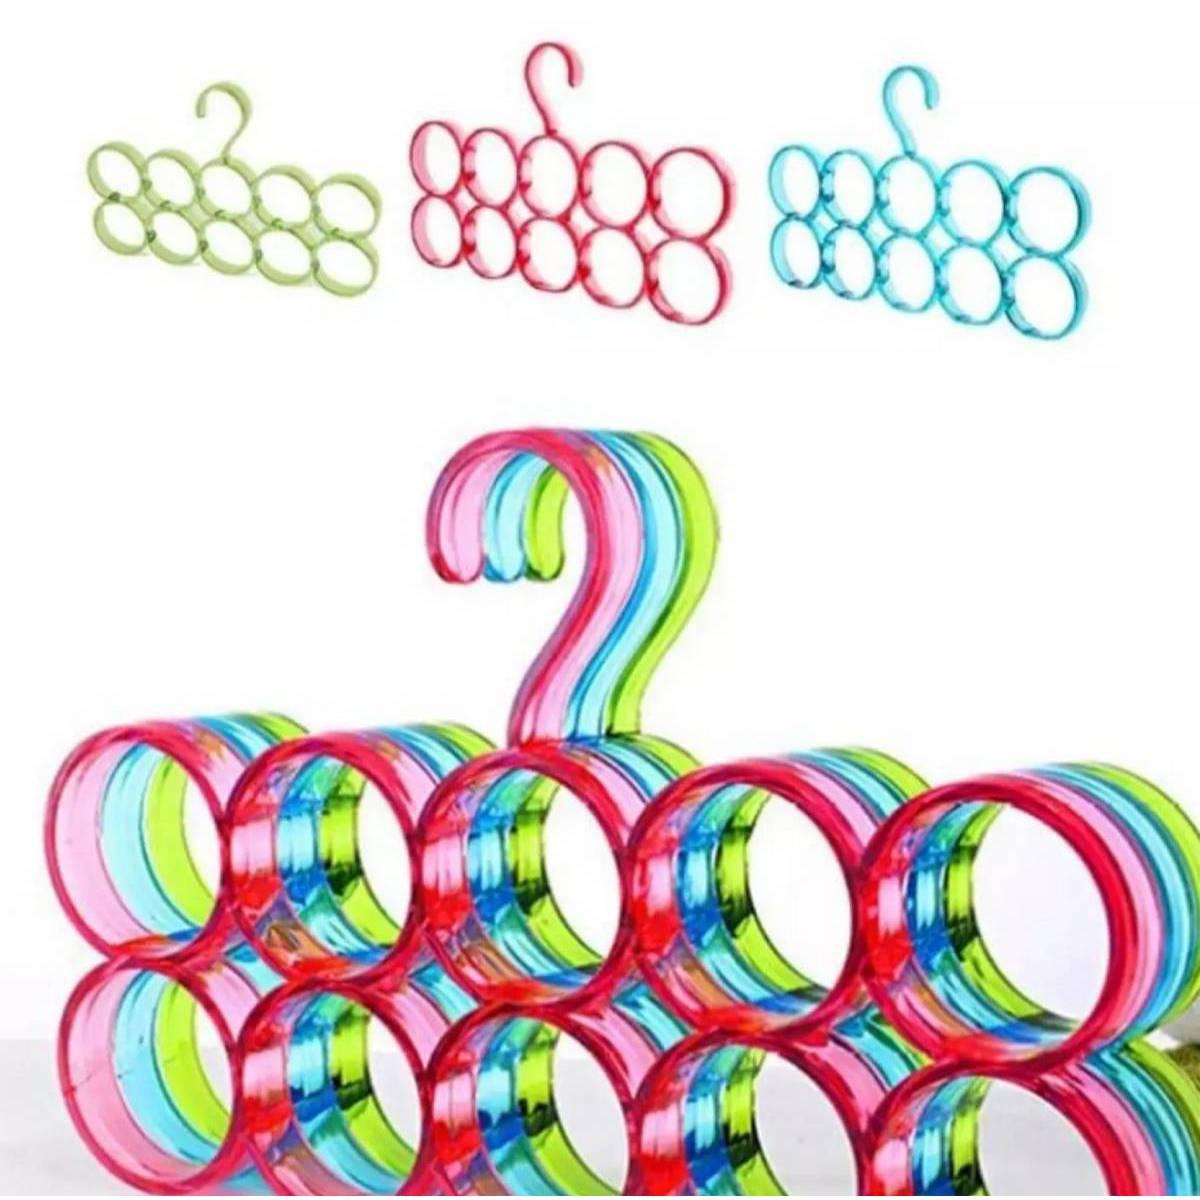 10 Rings Hole Plastic Coat Hanger Multifunctional Circle Shape Scarf Belt Tie Display Slots Holder Hole Design Bathrobe Organizer